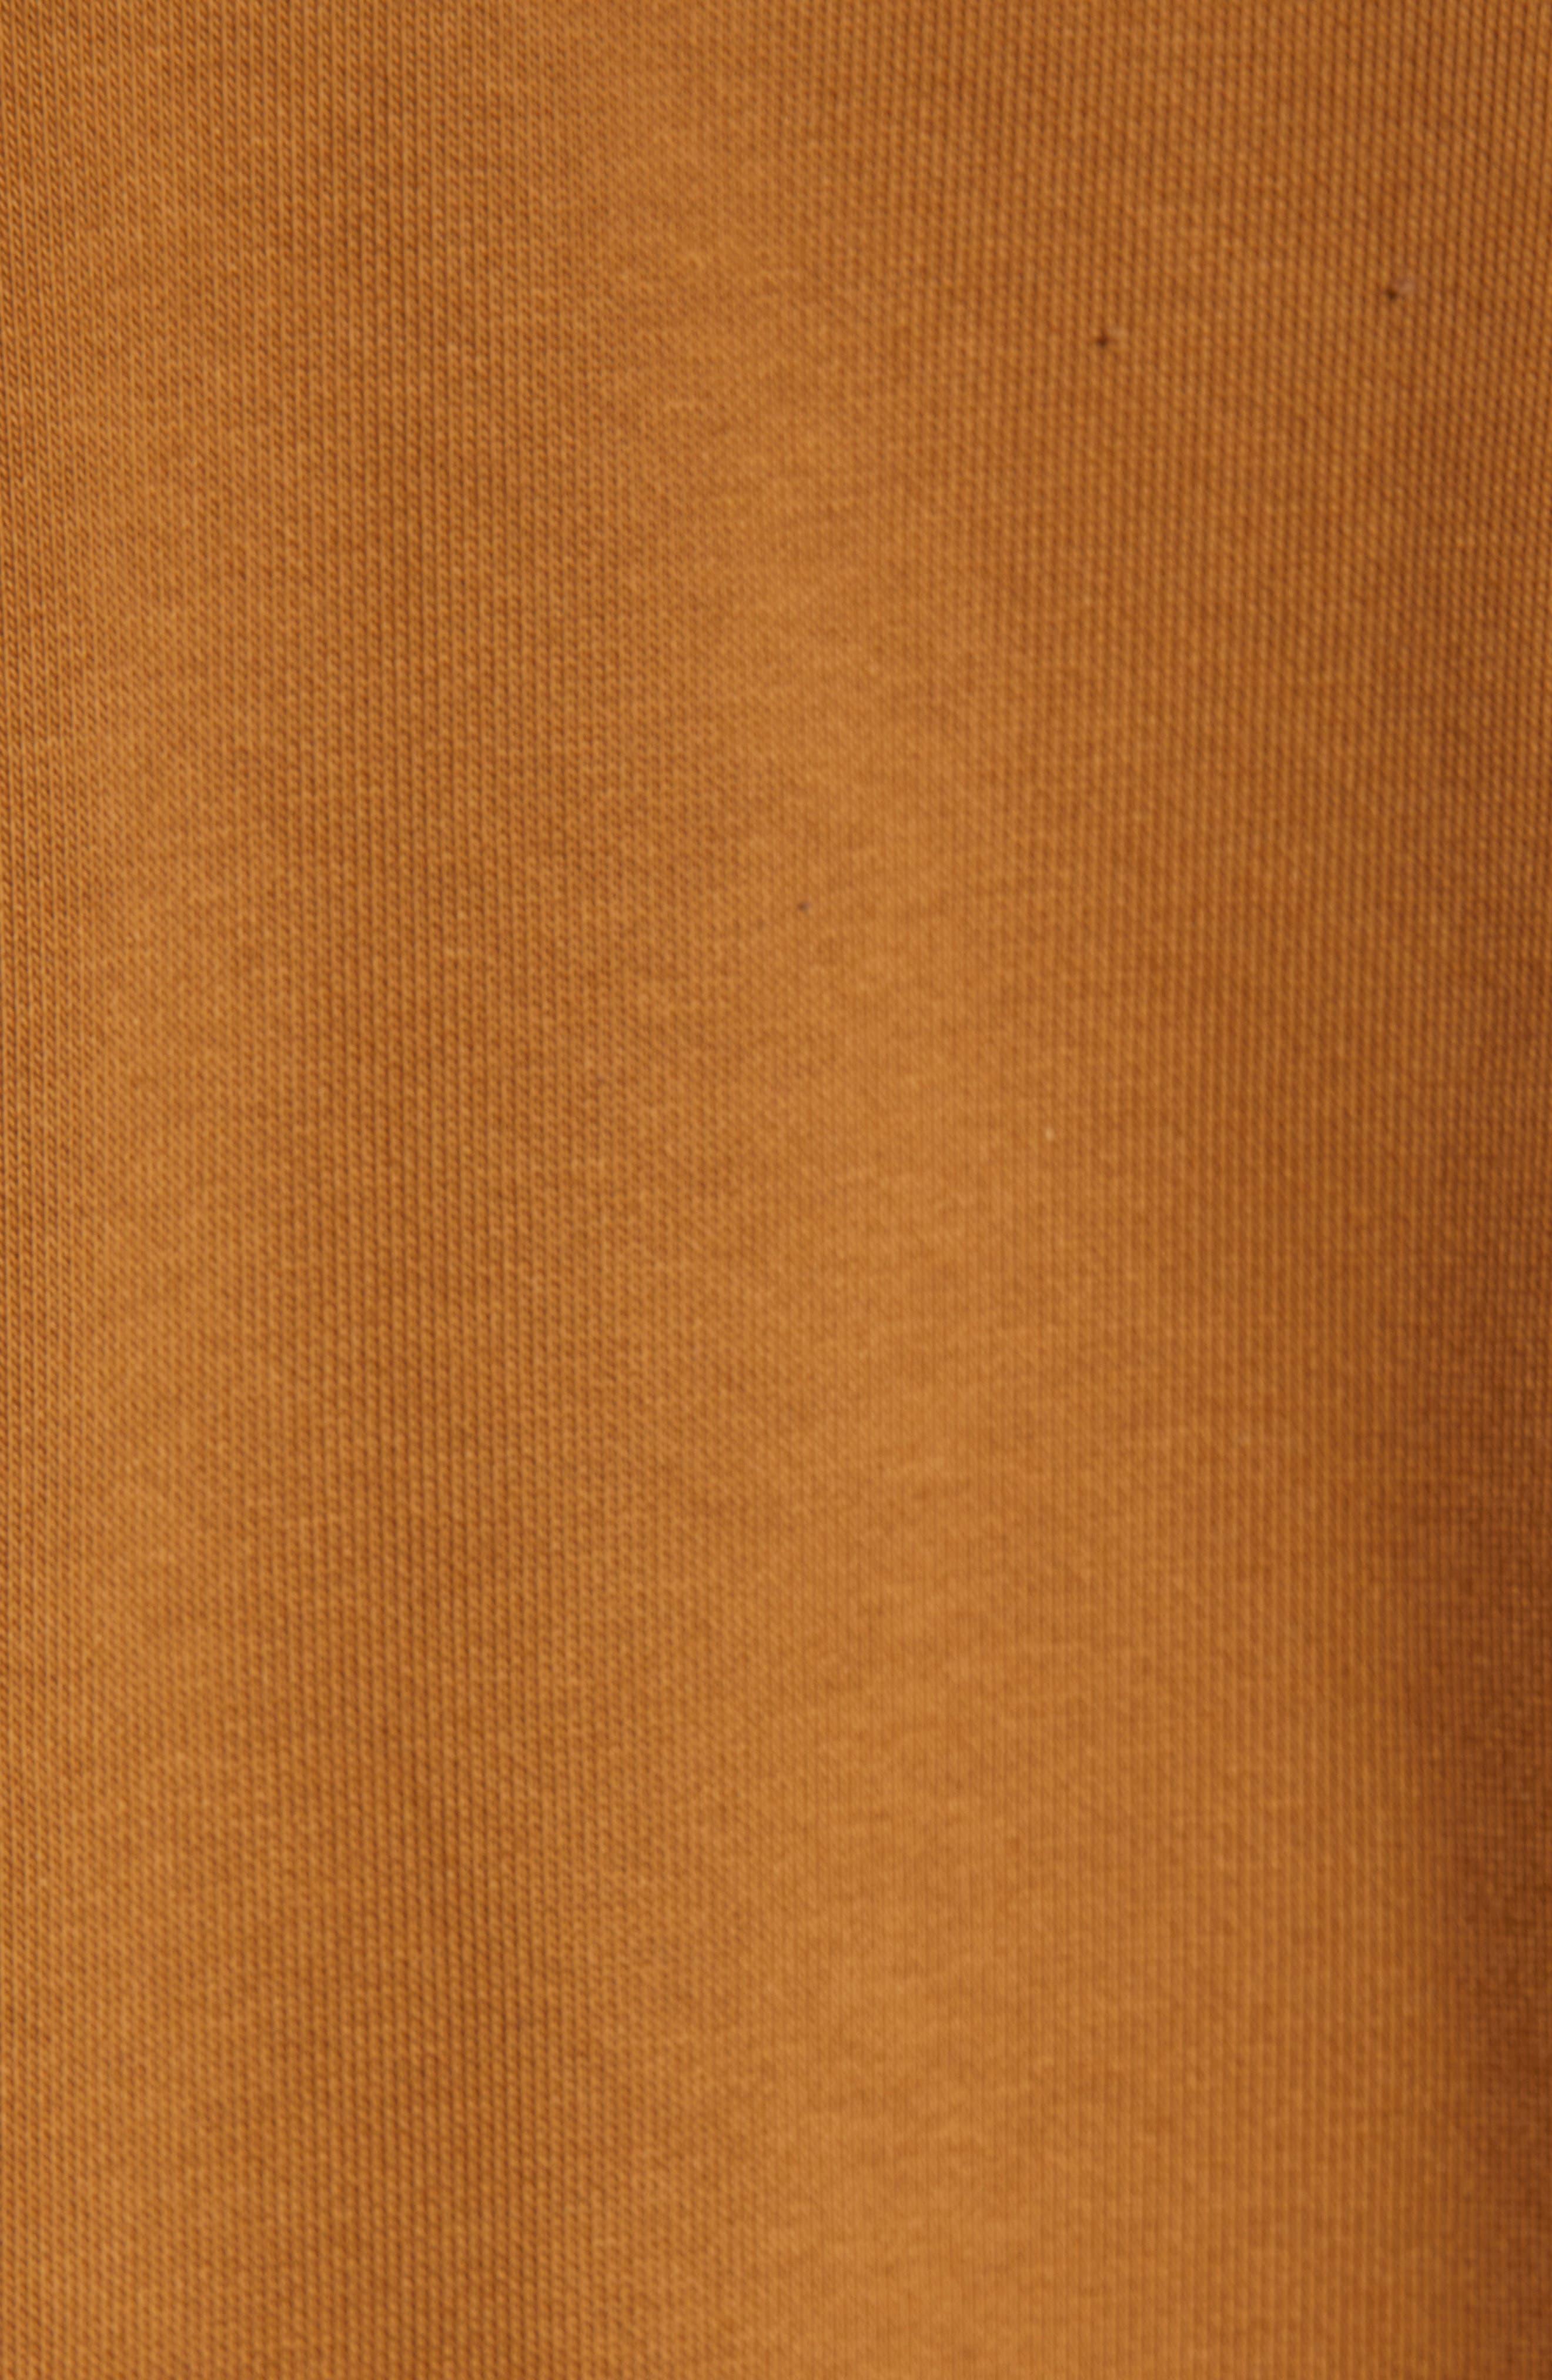 Logo Embroidered Hooded Sweatshirt,                             Alternate thumbnail 5, color,                             HAMILTON BROWN / BLACK